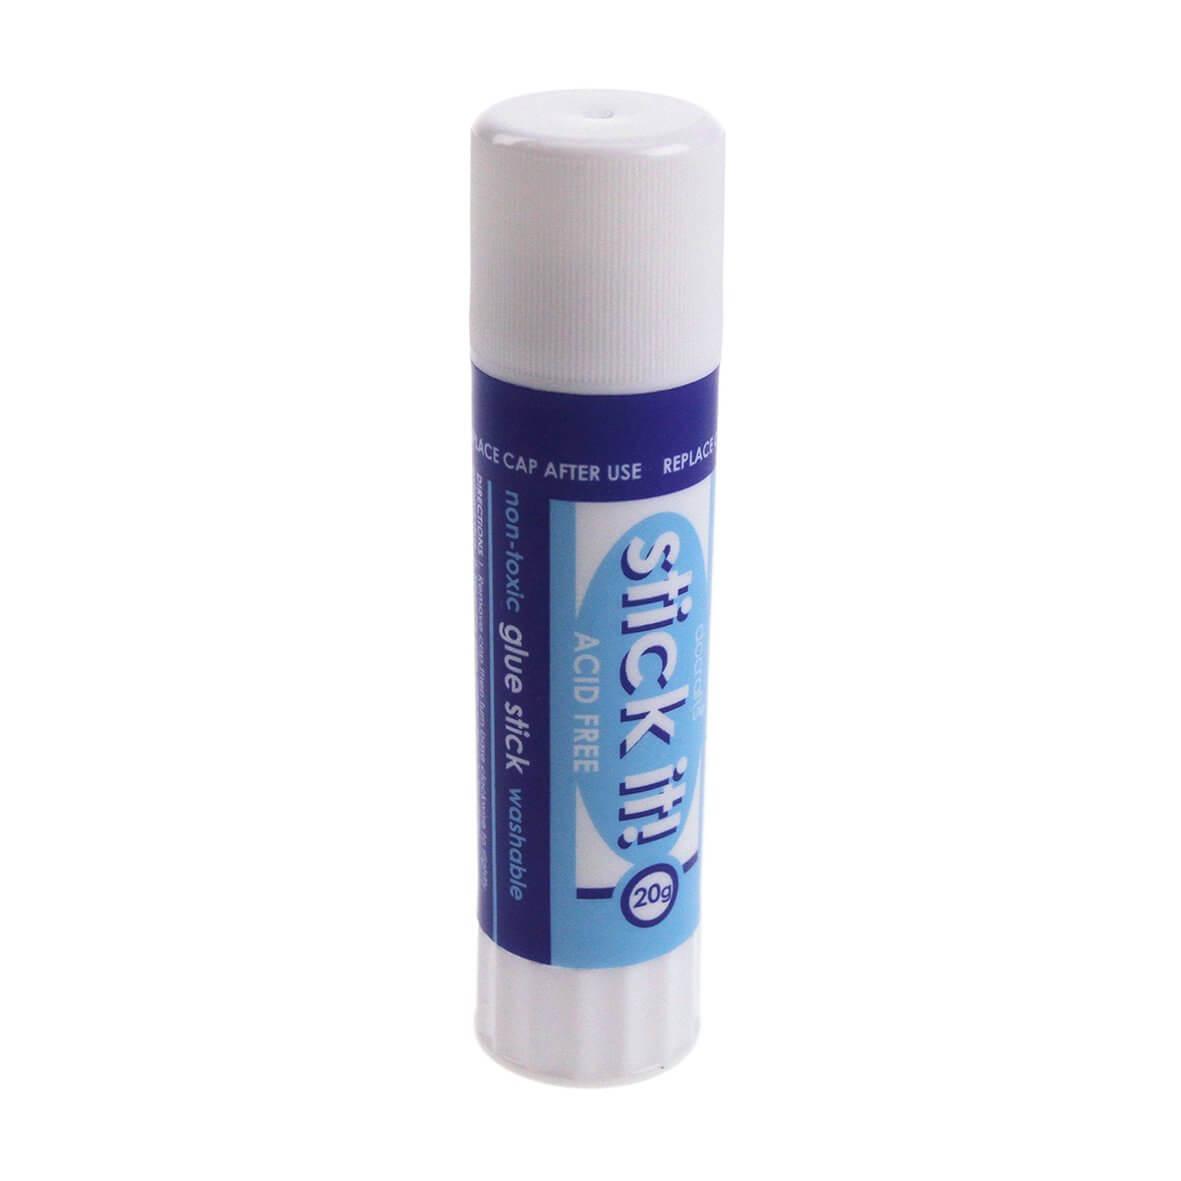 20g Stick It Glue Stick